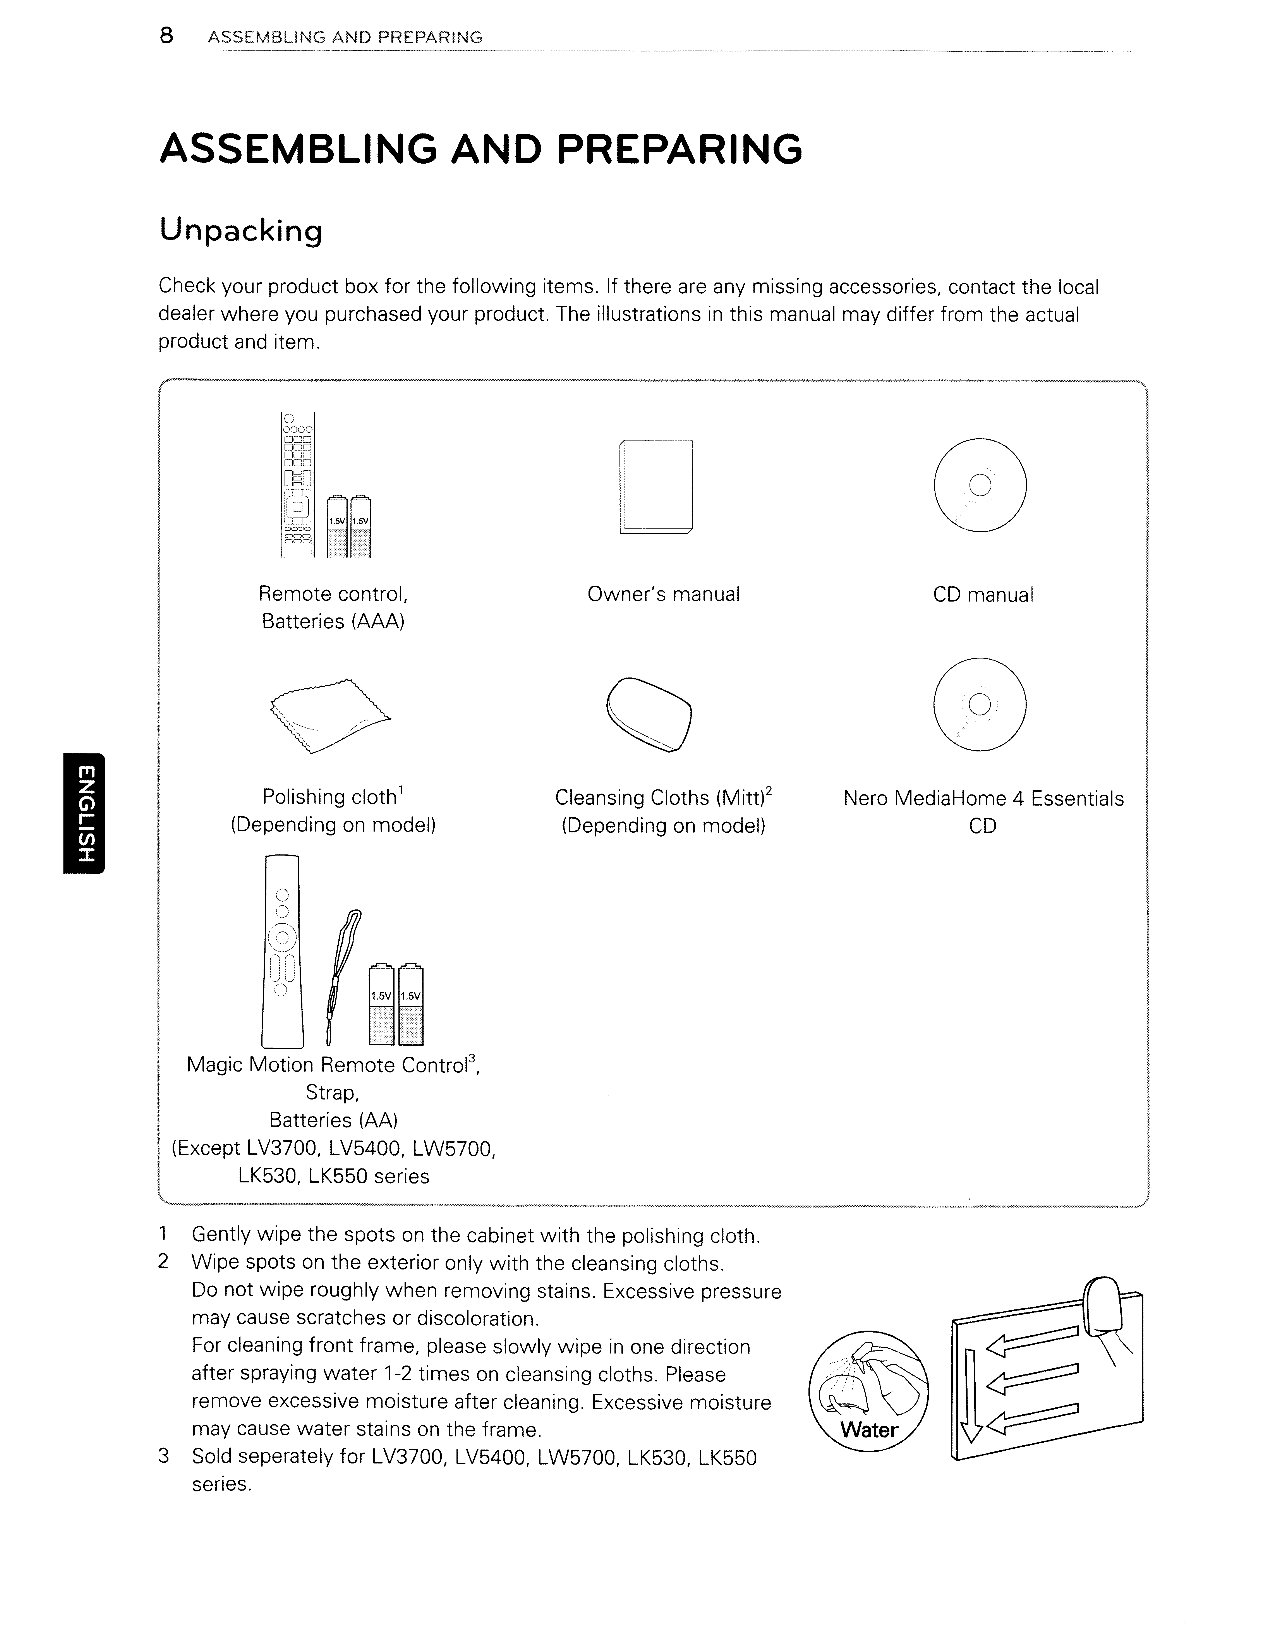 manual smart tv lg 5700 ebook rh manual smart tv lg 5700 ebook tempower us